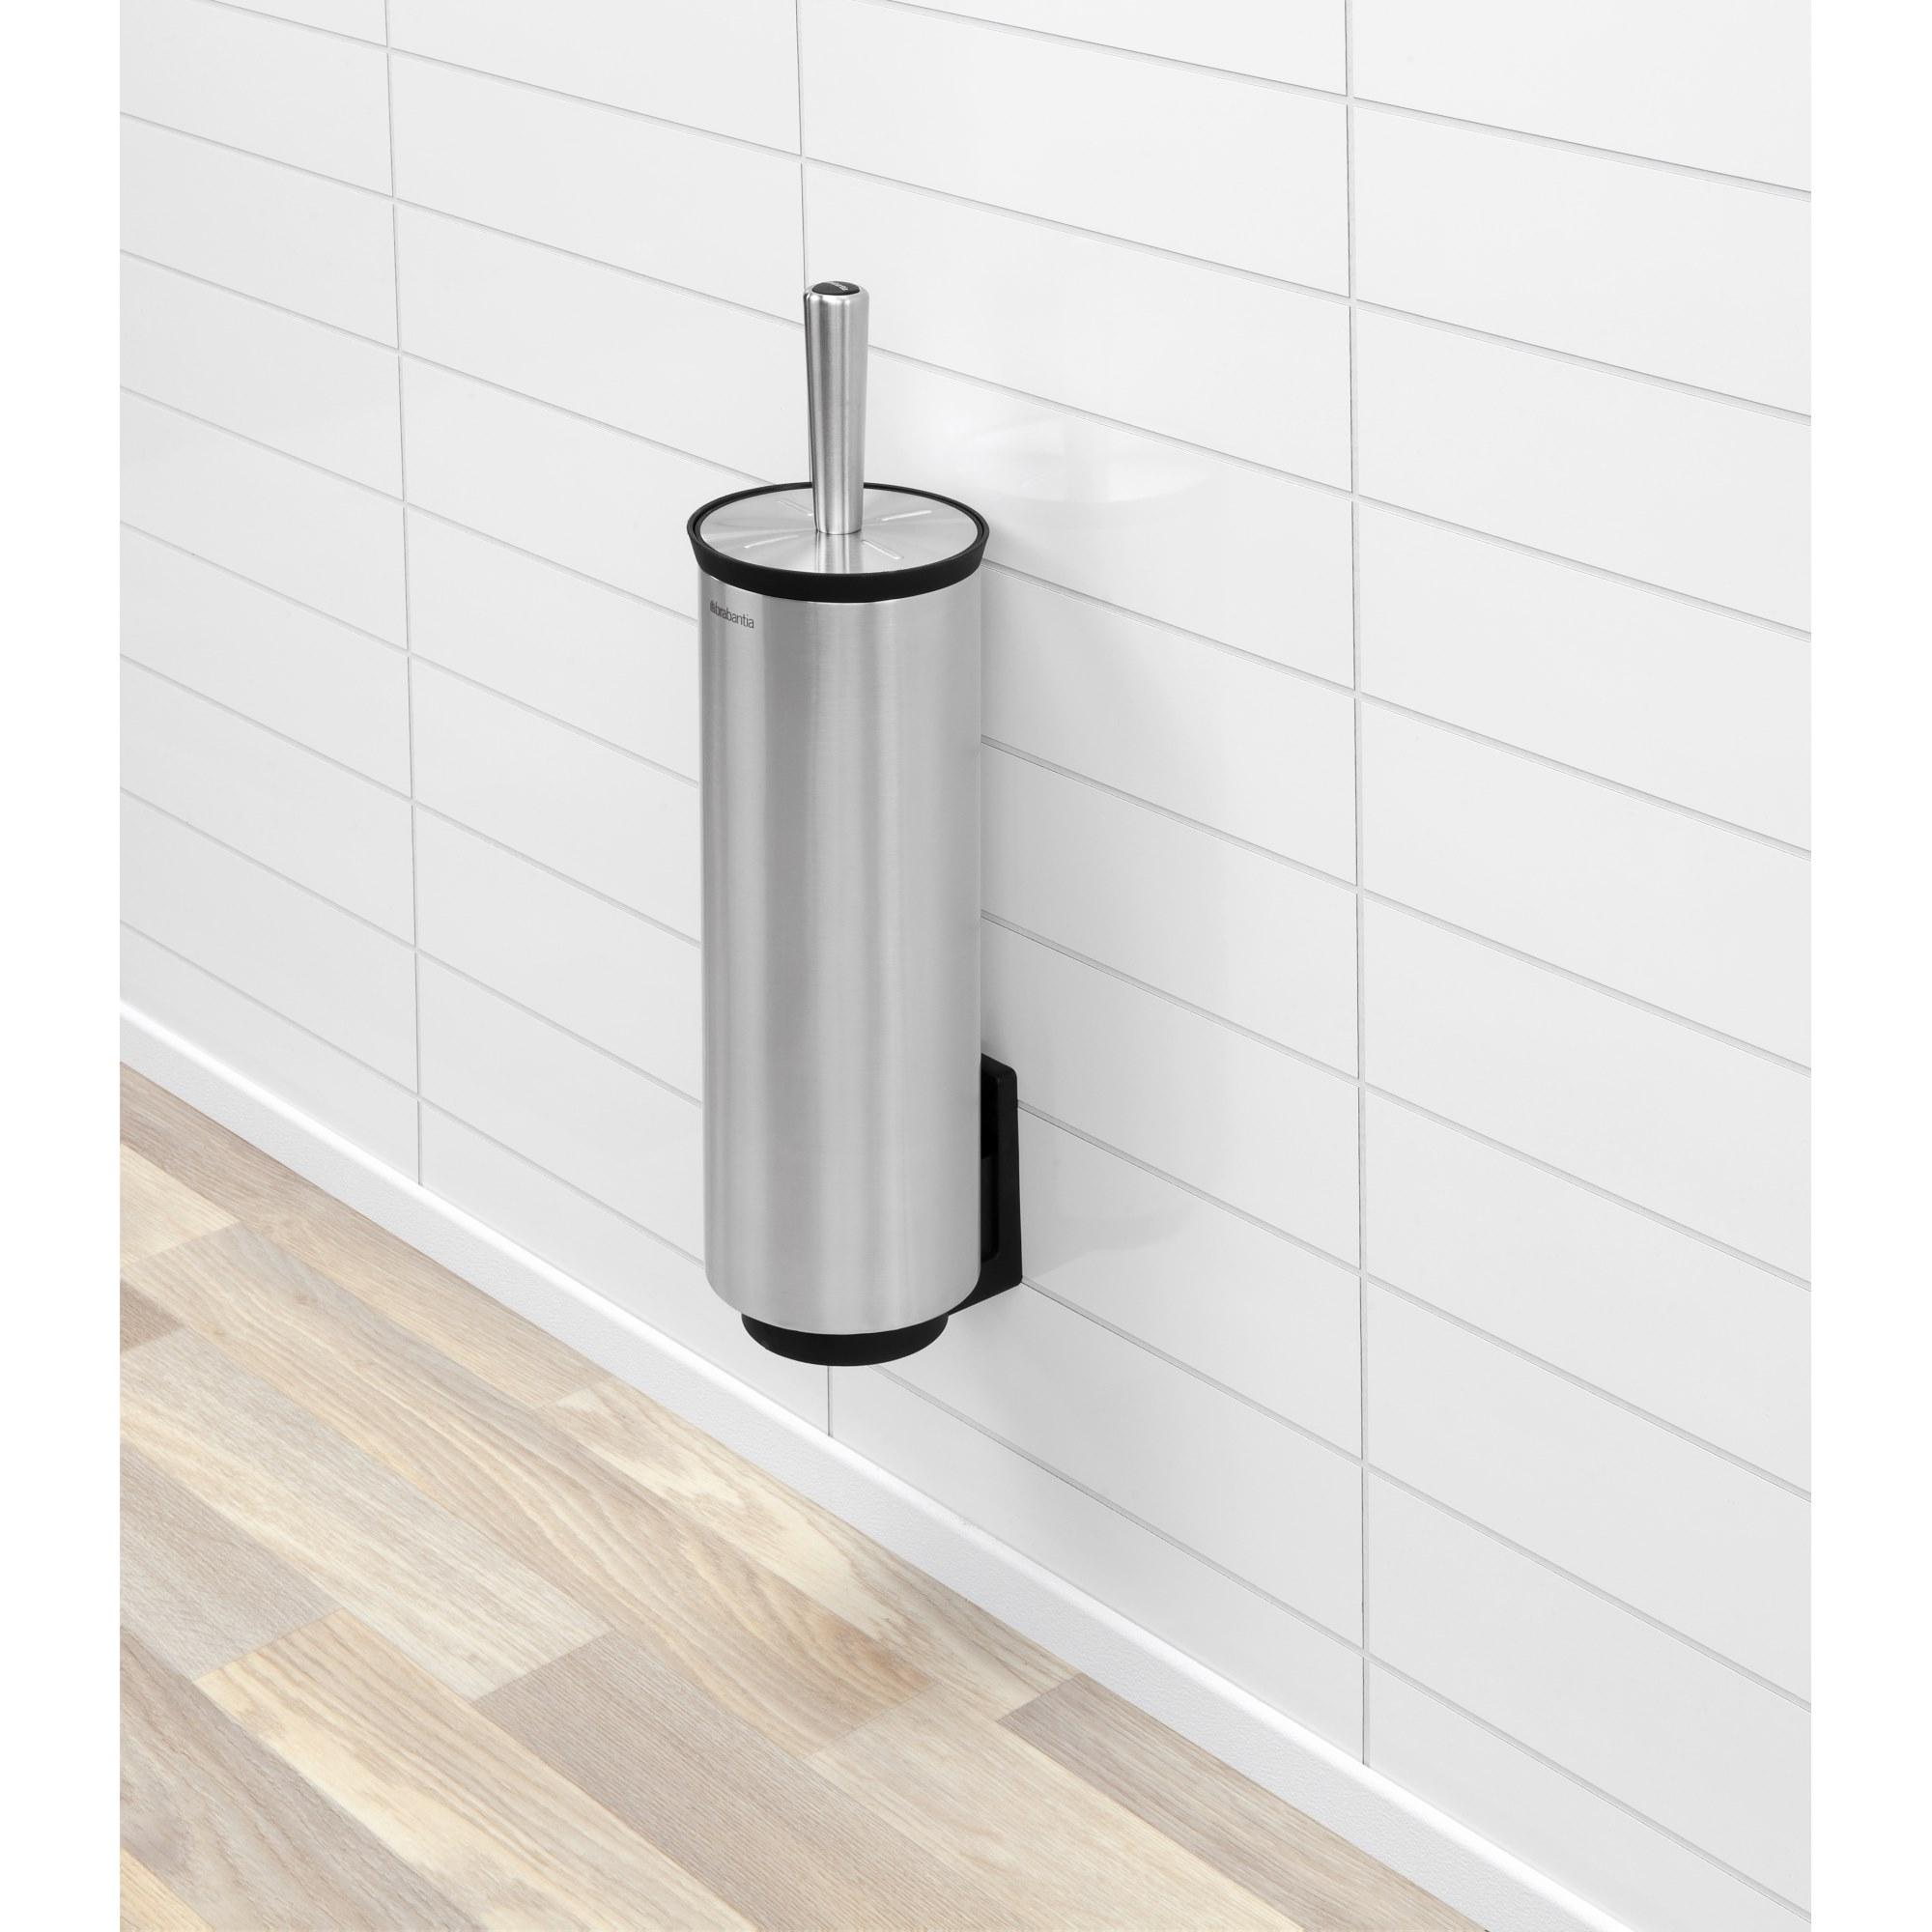 brabantia toilettenb rste deluxe mit halter edelstahl matt steel toilettenb rsten halter. Black Bedroom Furniture Sets. Home Design Ideas